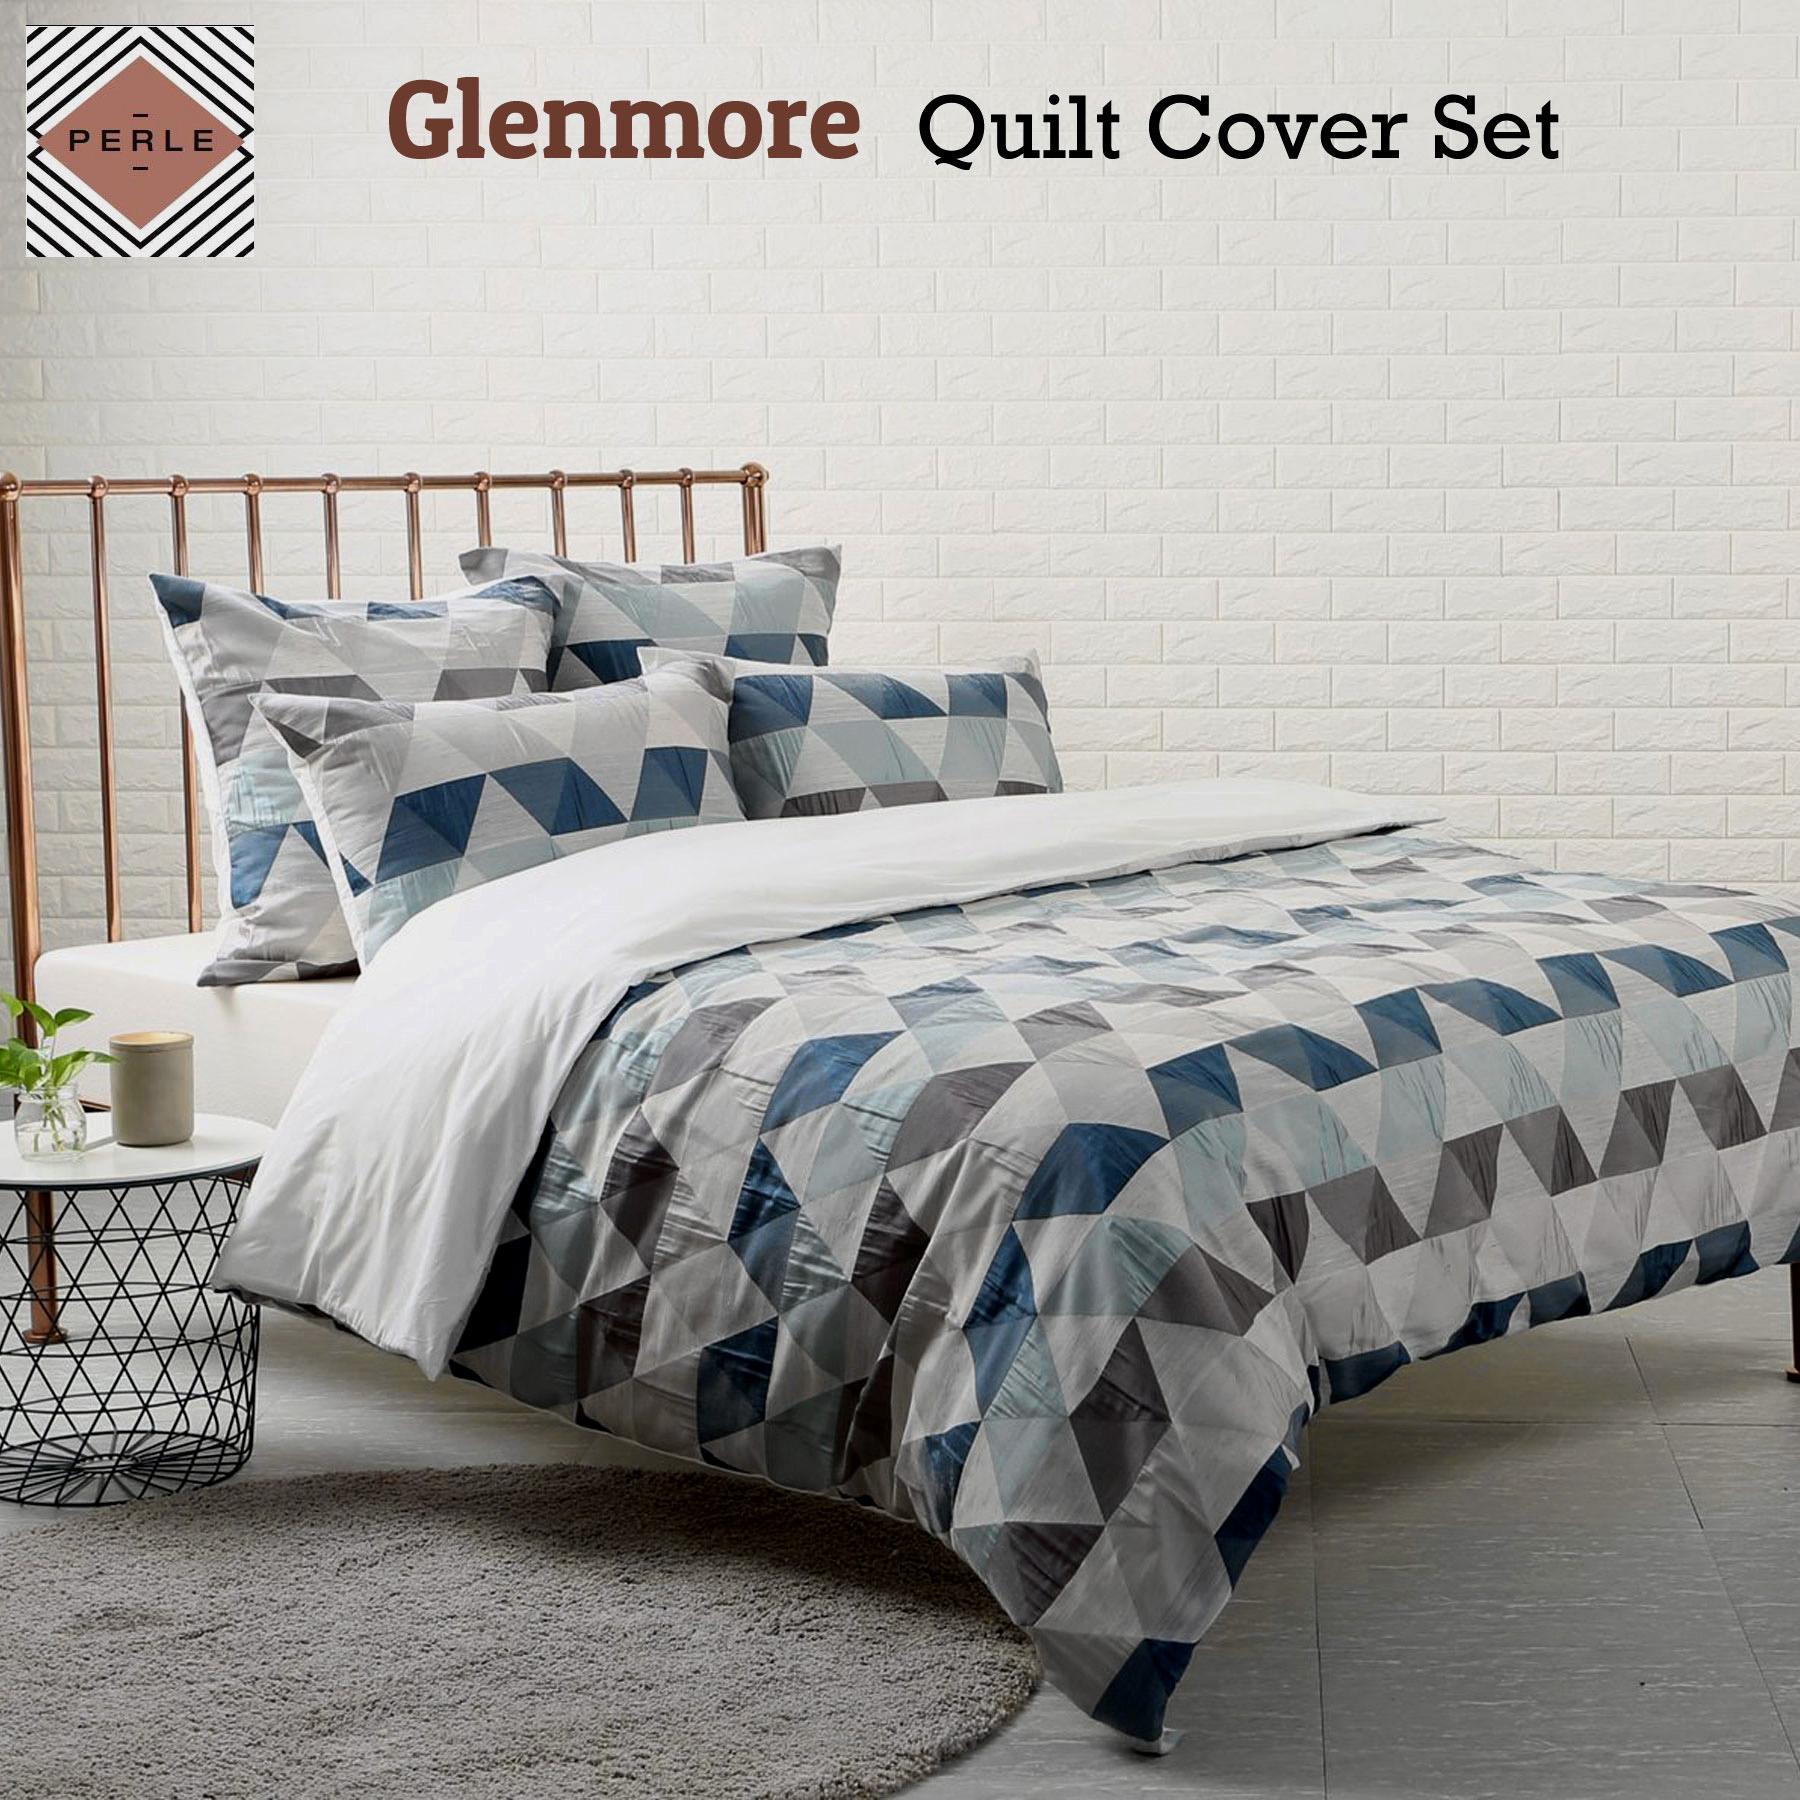 Details about glenmore quilt cover set by perle linge de maison queen king super king